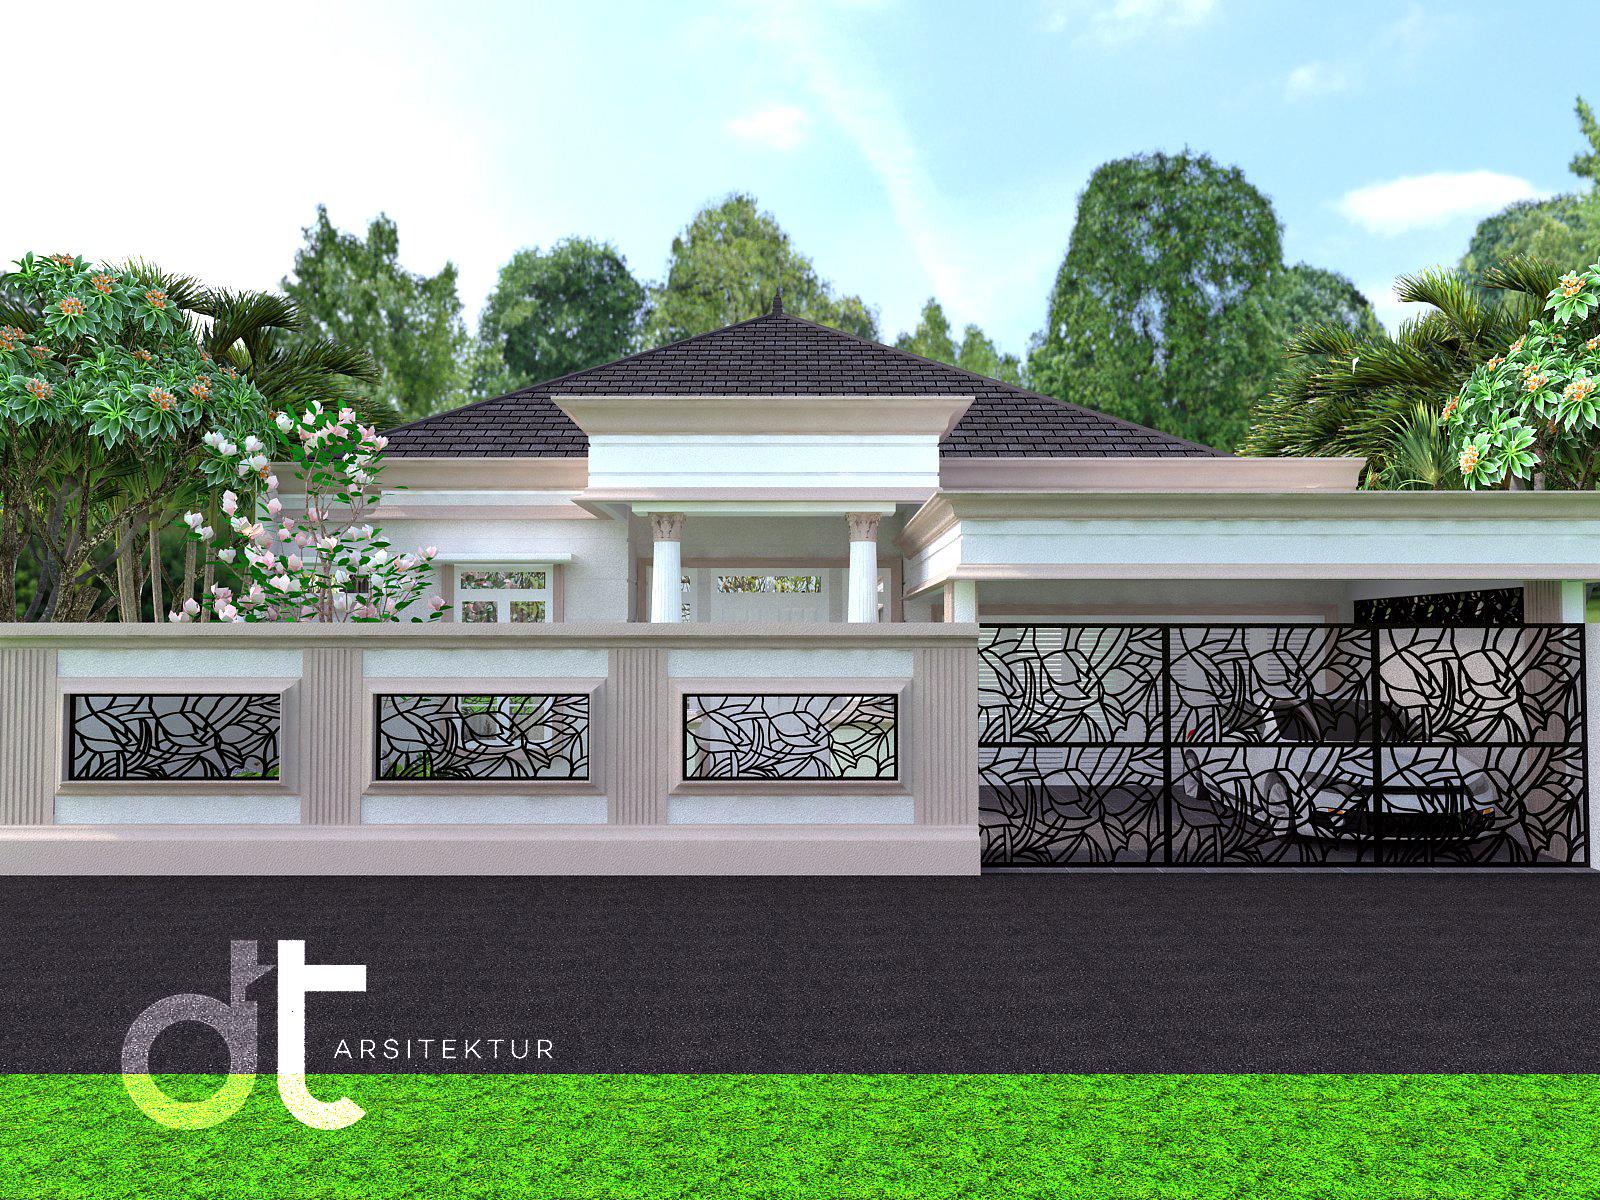 Desain Gambar Pembangunan Arsitek Jakarta Utara